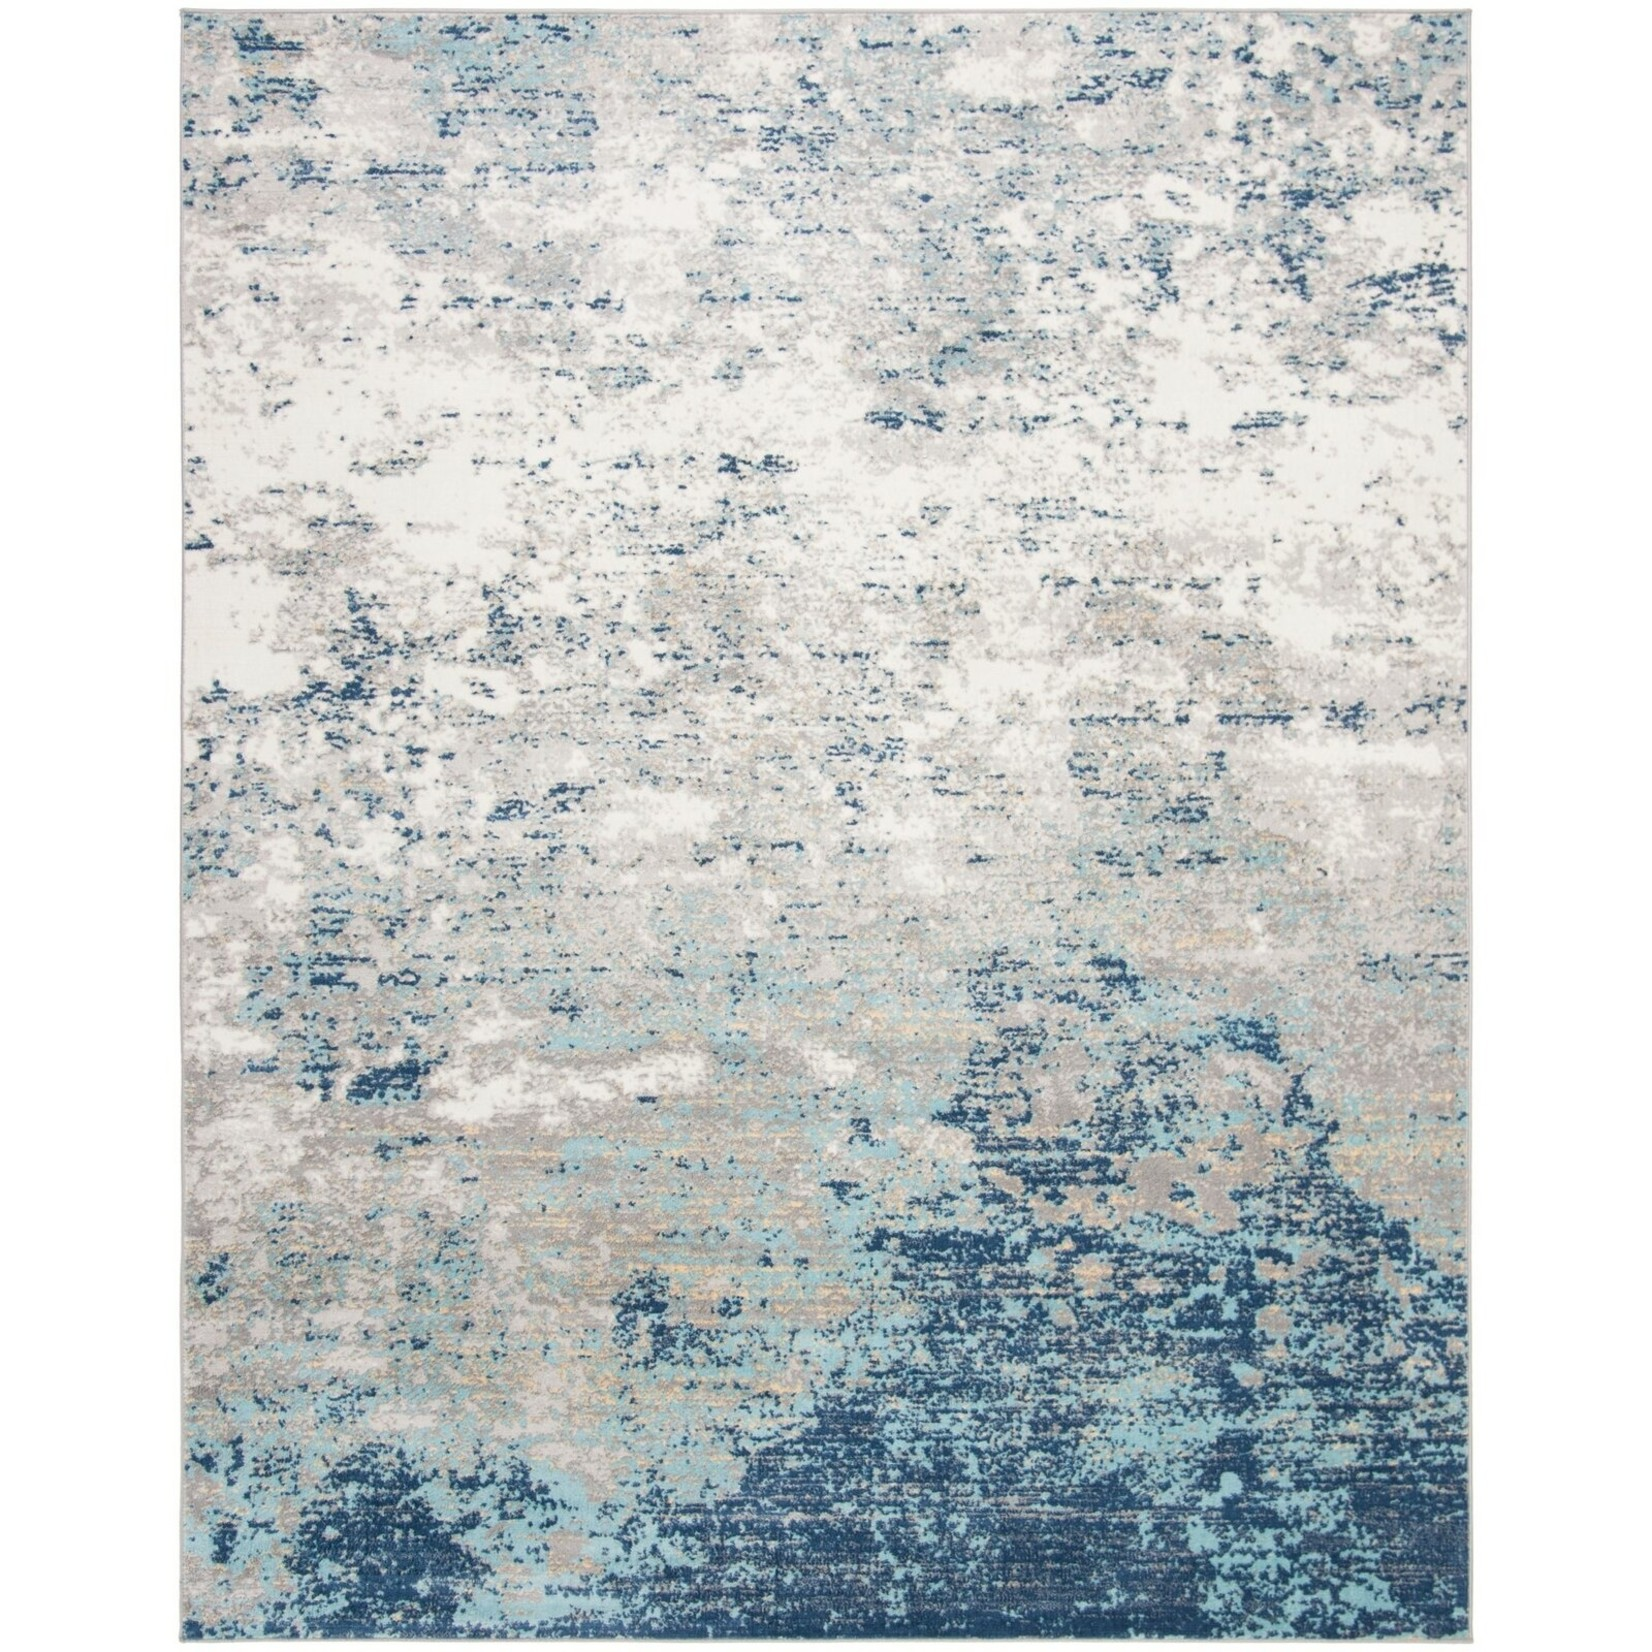 *12' x 18' - N'Keal Light Gray/Blue Rug